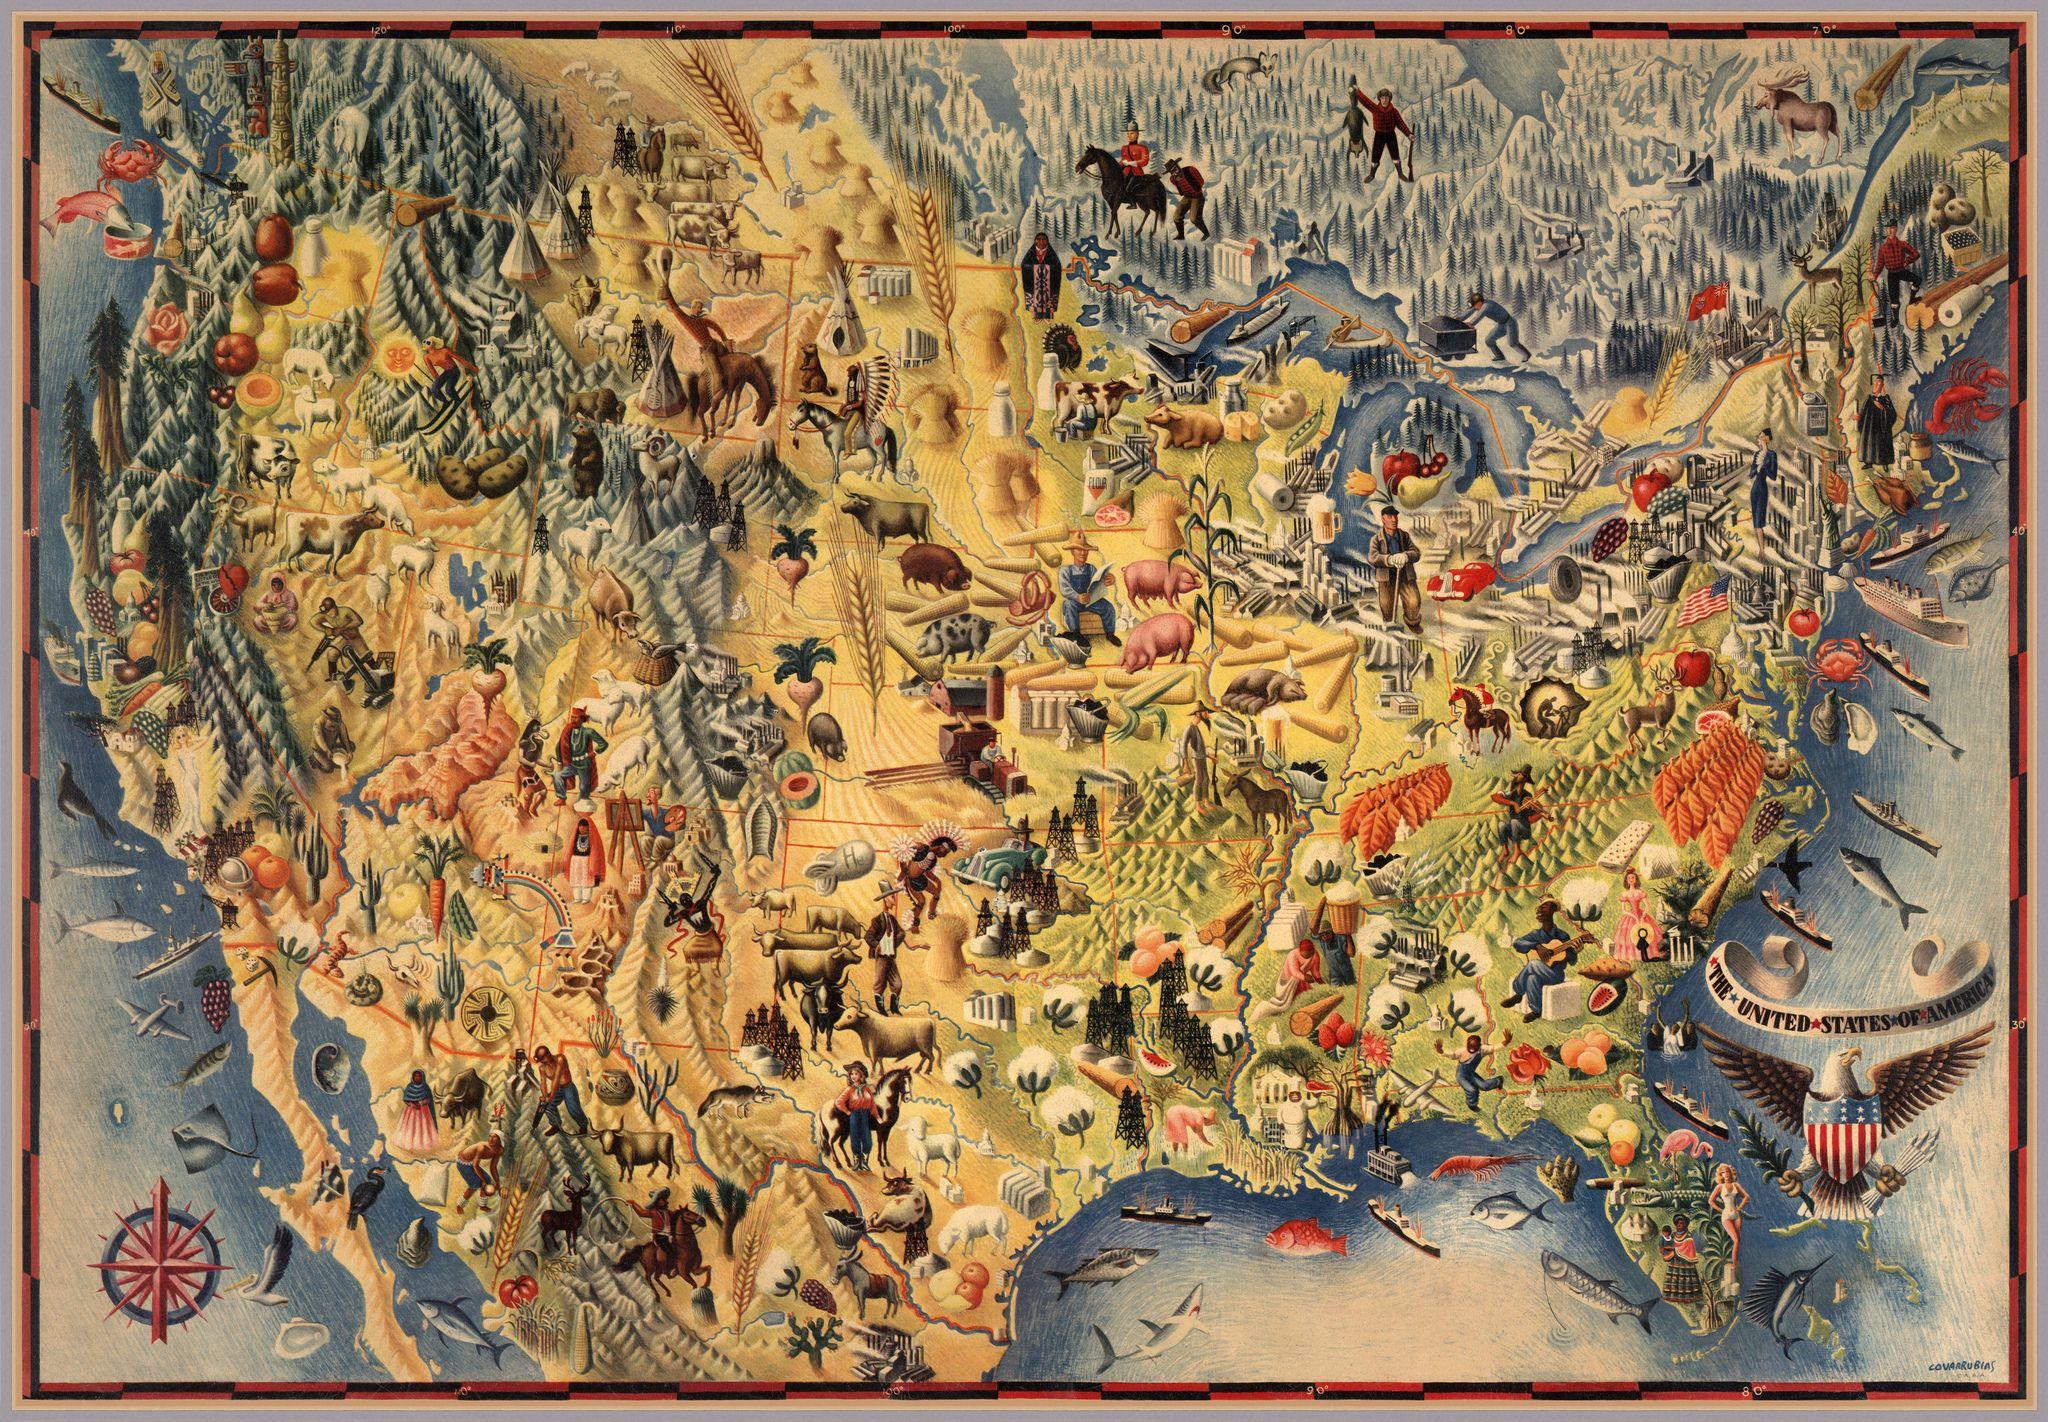 USPictorialMap Pictorial maps